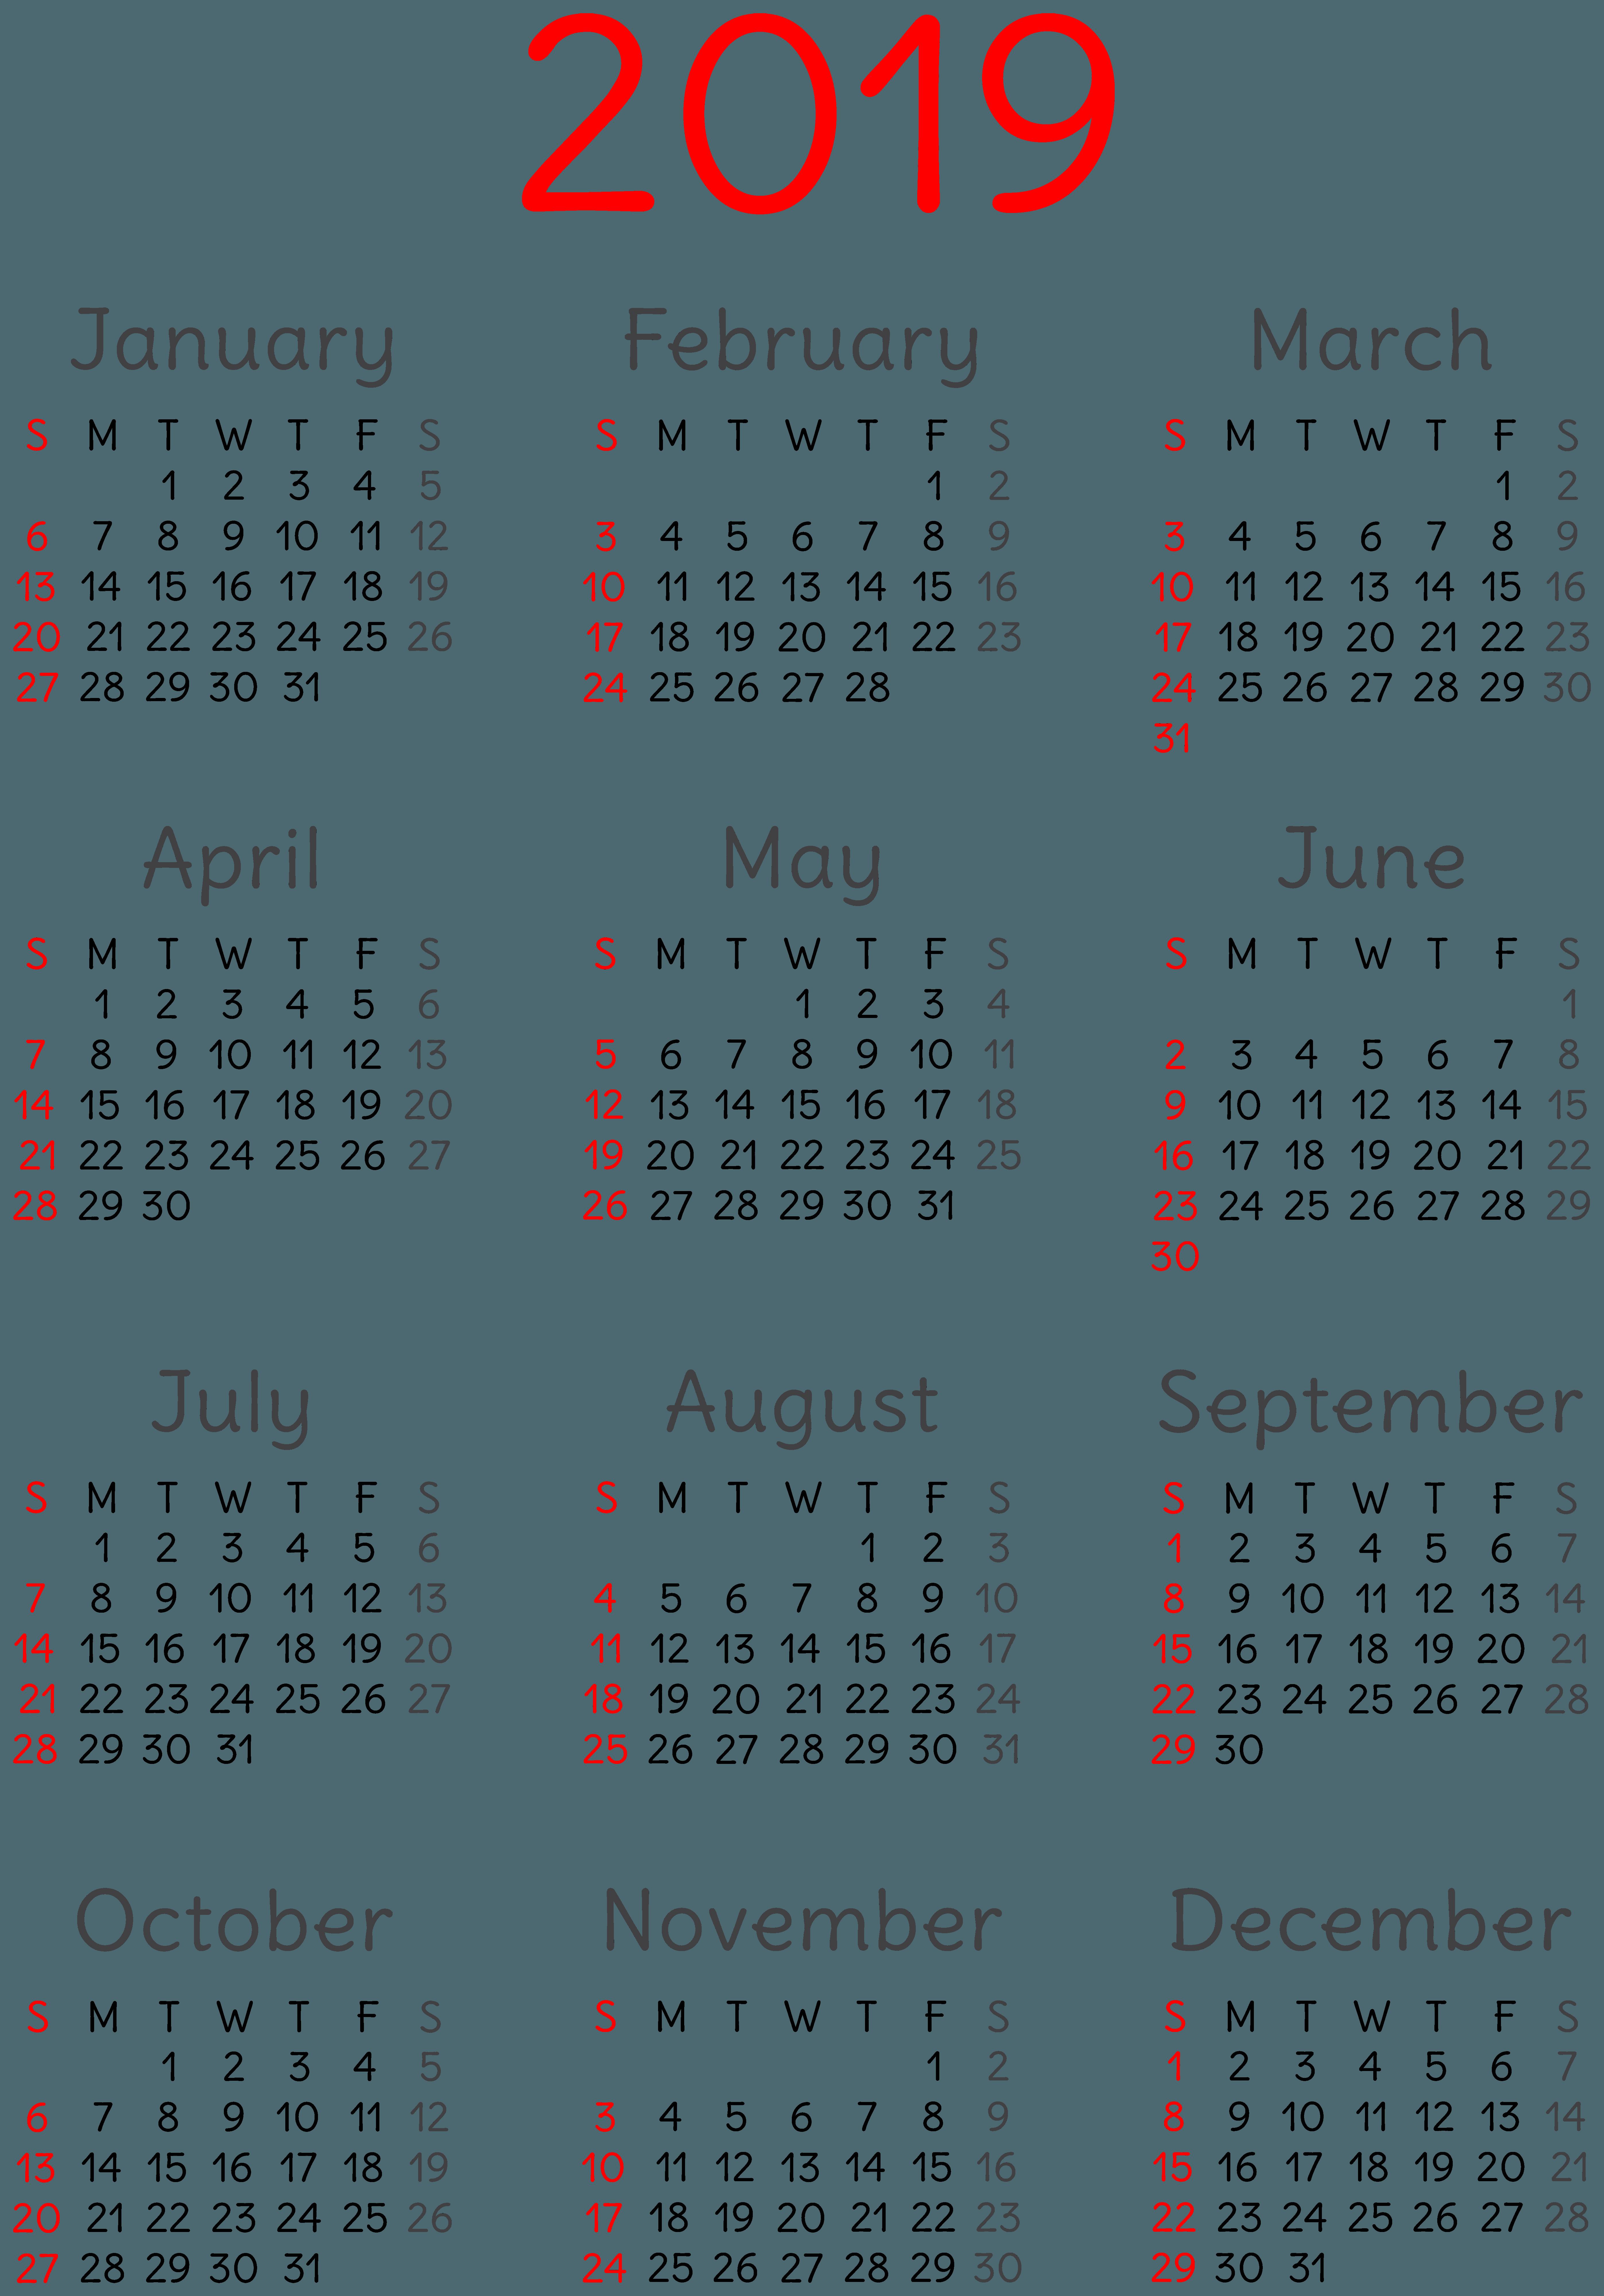 Calendar 2019 Wallpapers - Wallpaper Cave